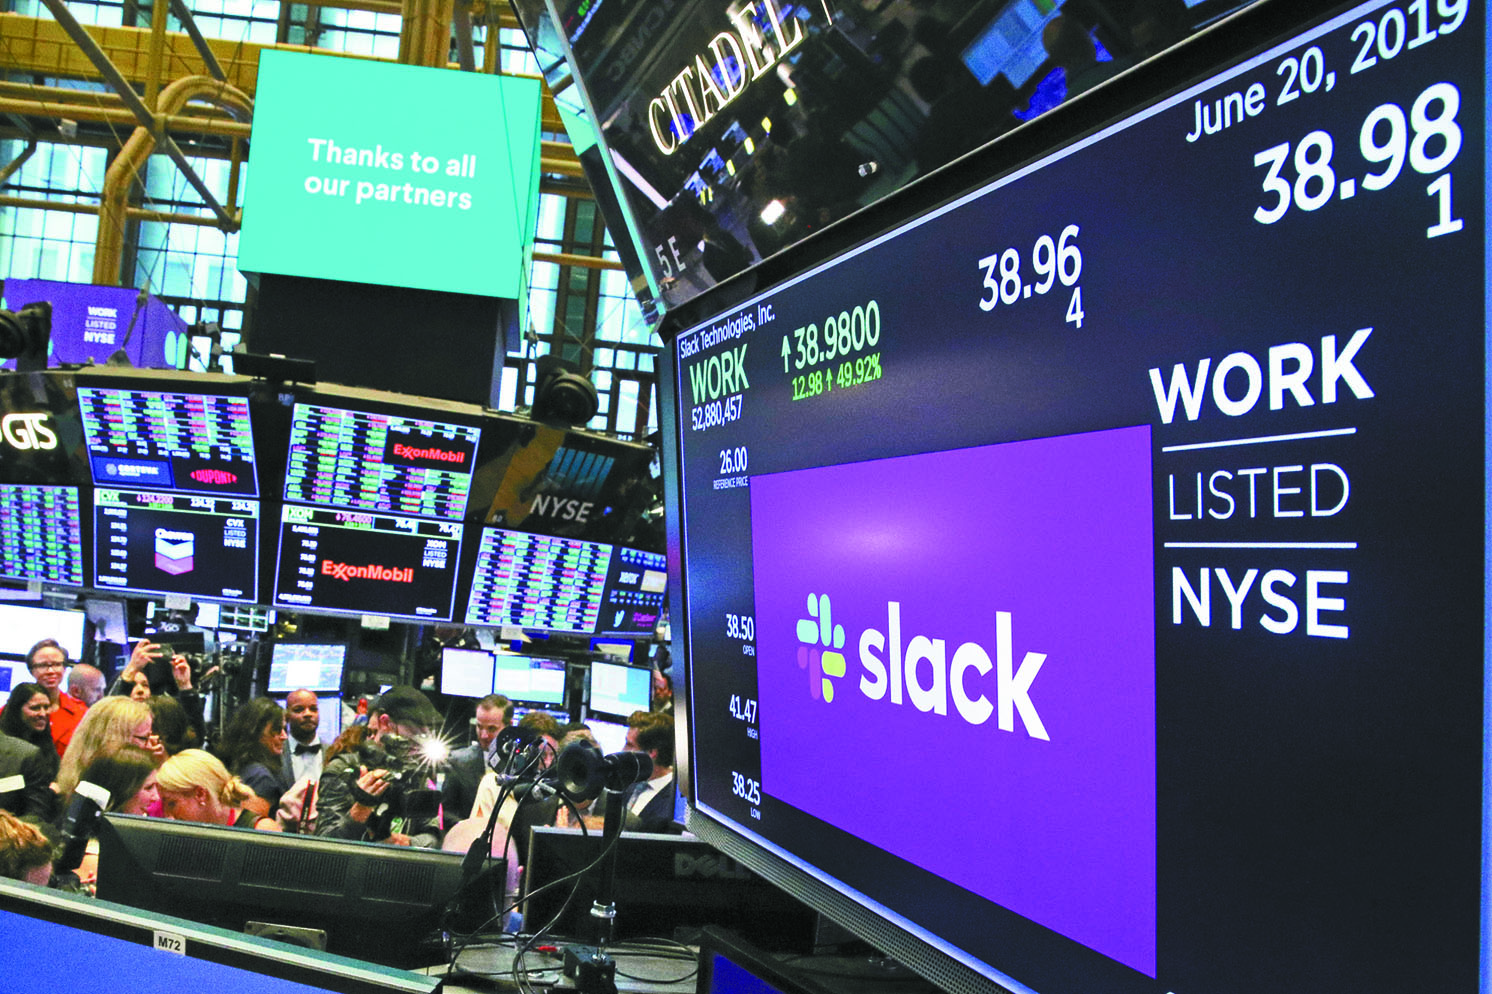 Slack盈利困局難解   多倫多   加拿大中文新聞網 - 加拿大星島日報 Canada Chinese News